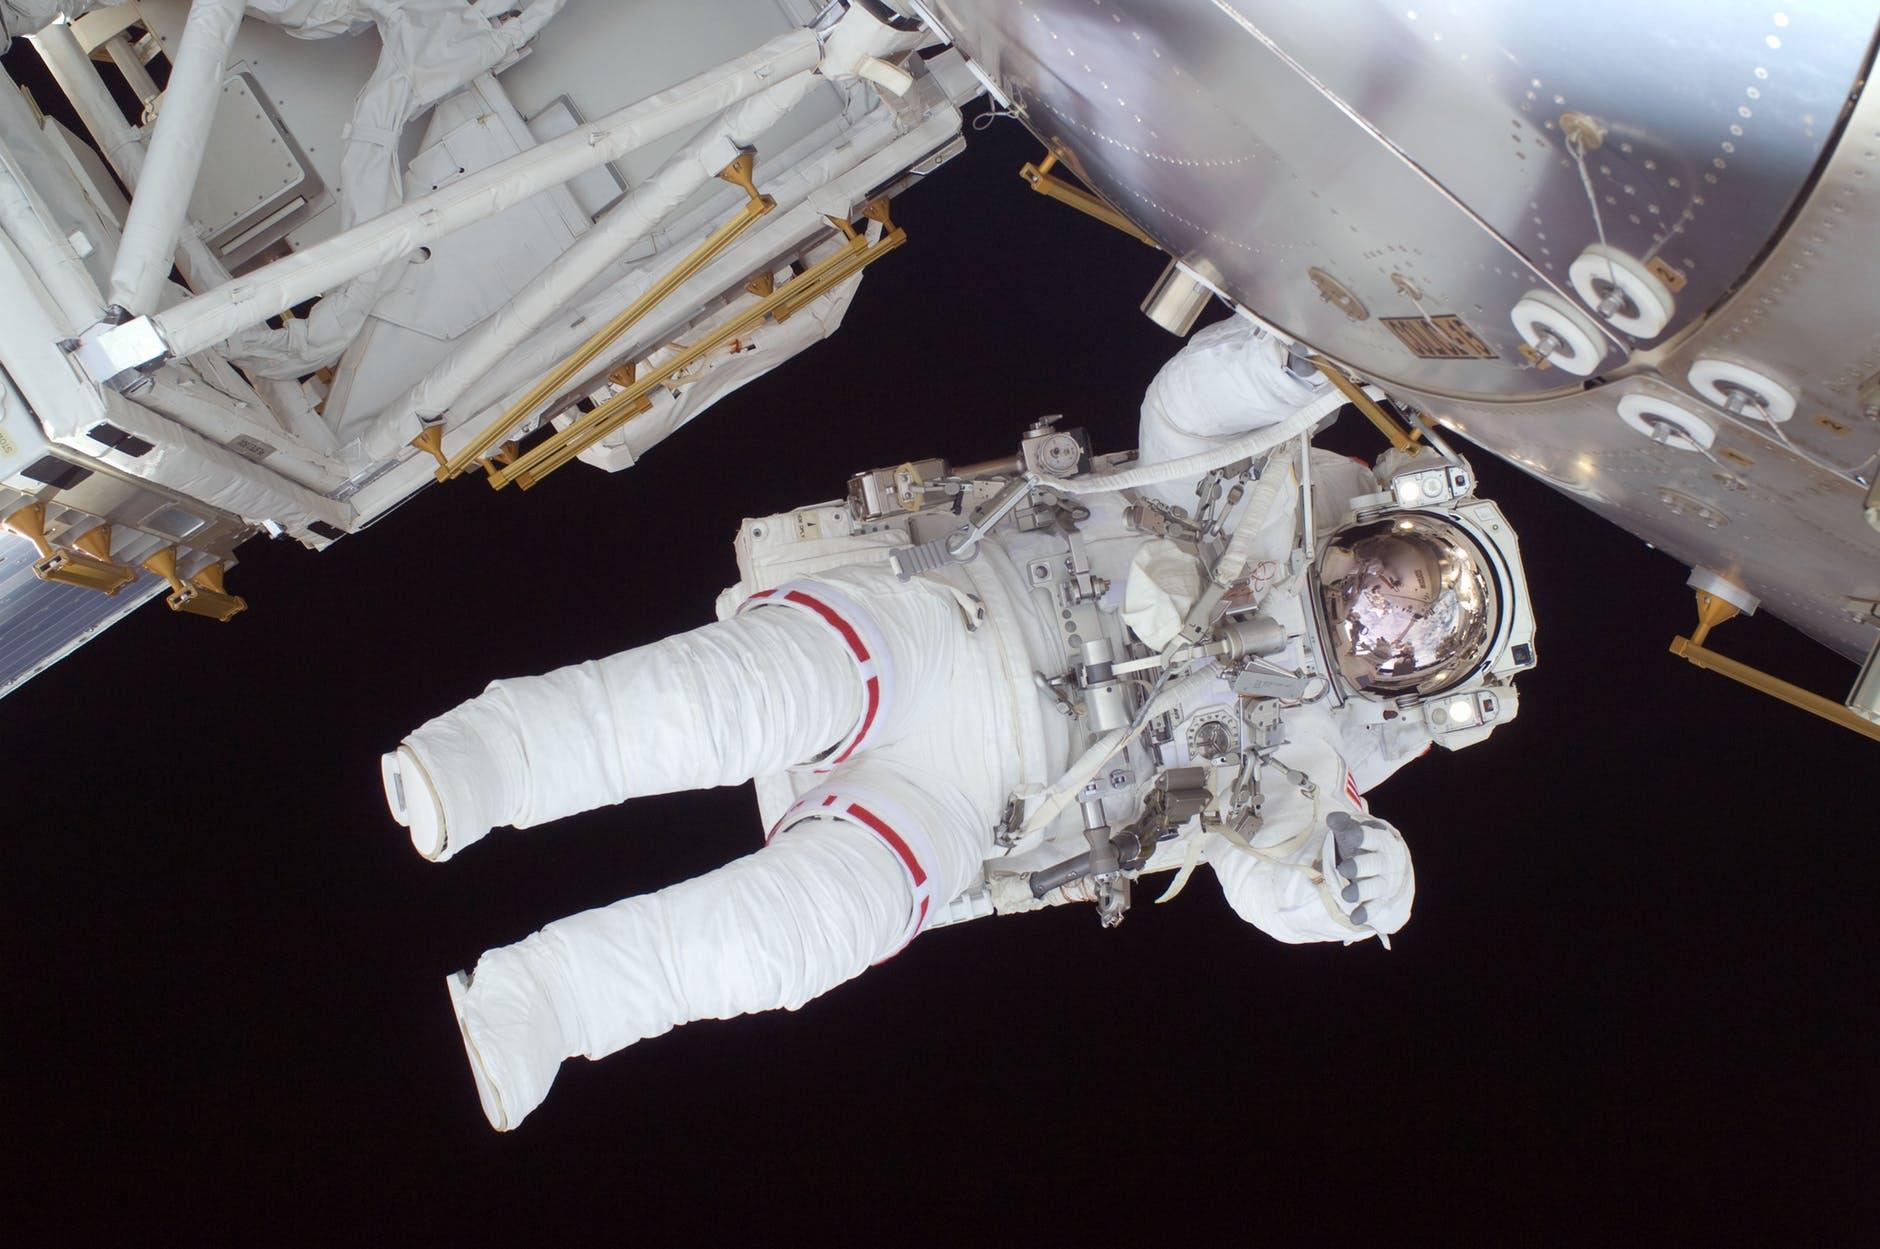 astronaut-spacewalk-space-shuttle-discovery-39651.jpeg